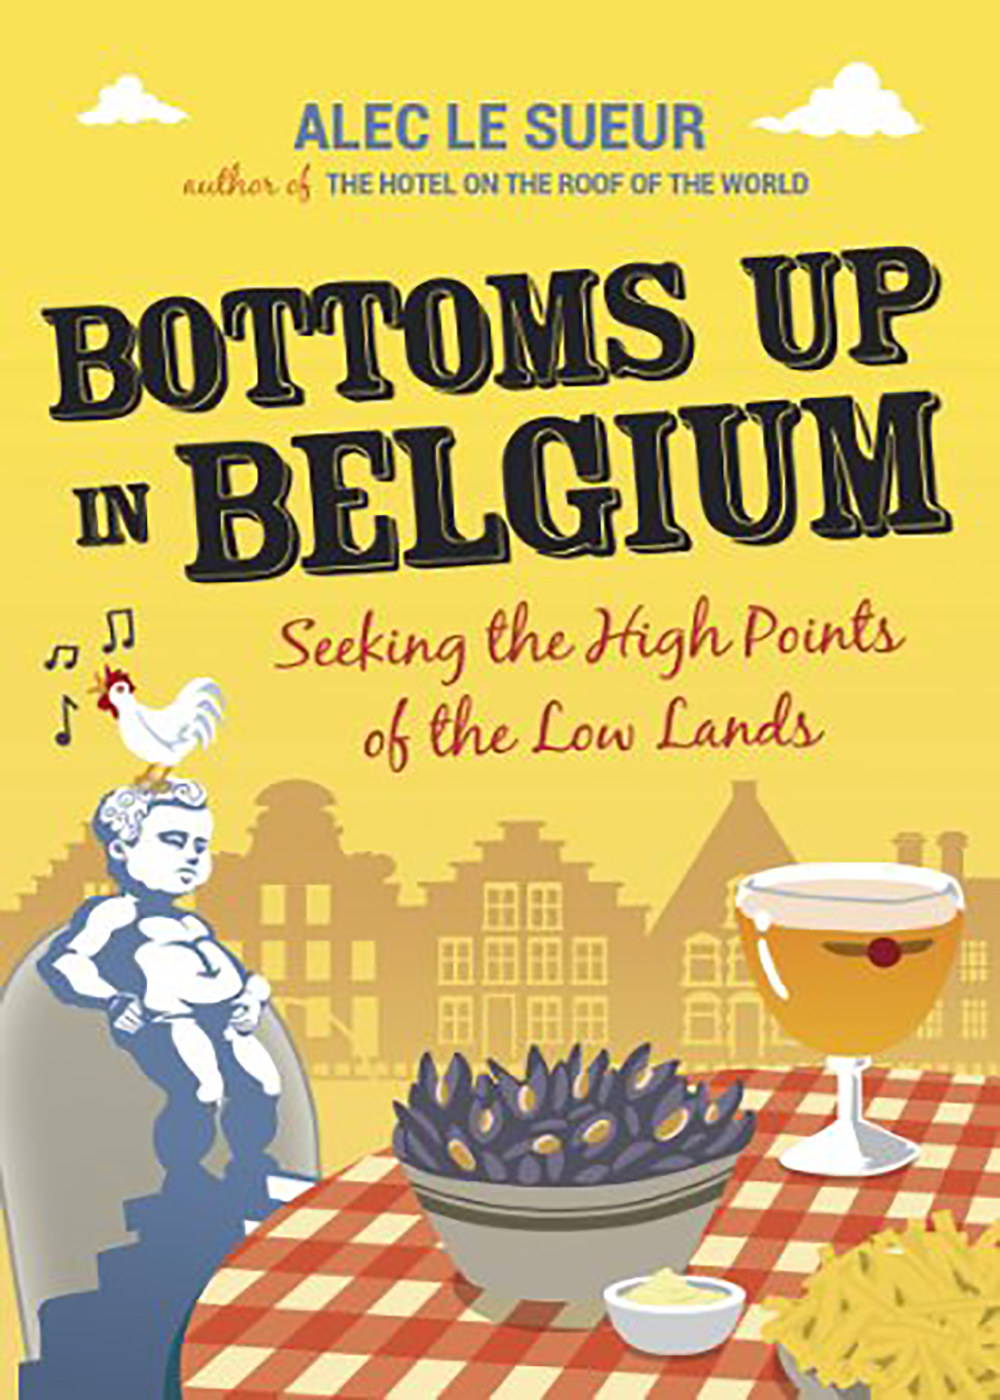 Alec Le Sueur - Bottoms Up in Belgium